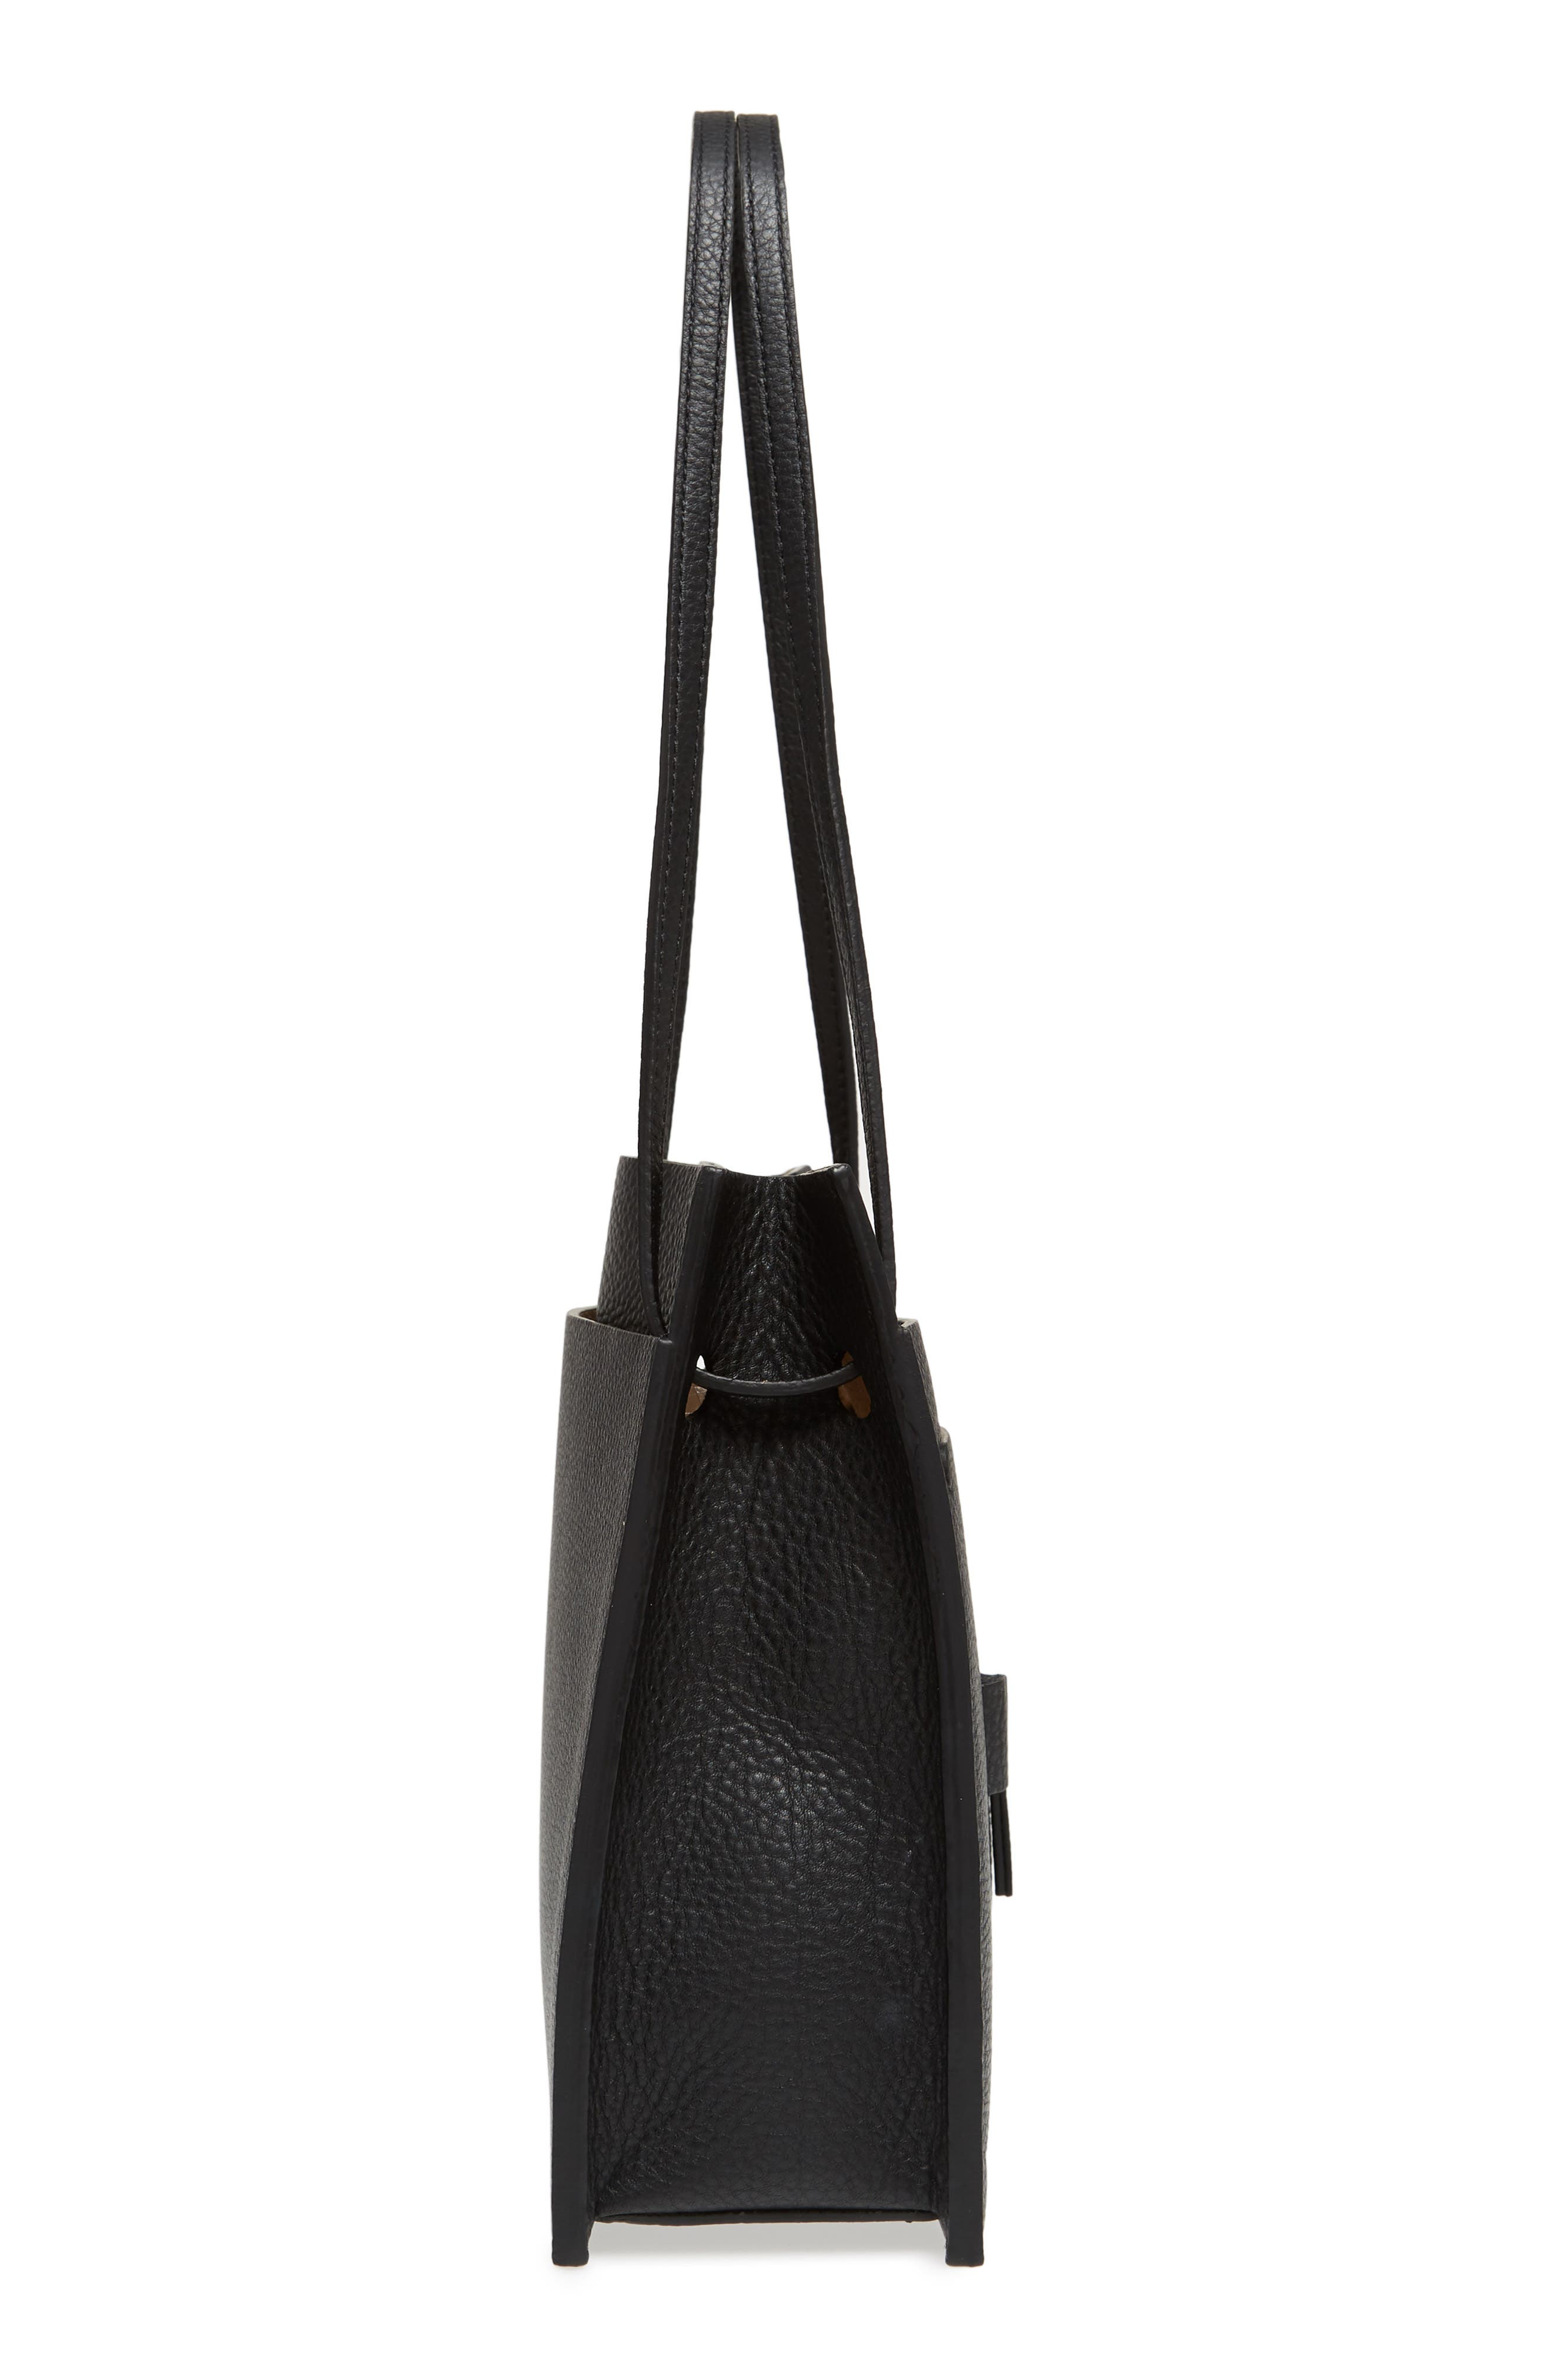 Kit Leather Convertible Shoulder Bag,                             Alternate thumbnail 6, color,                             TRUE BLACK